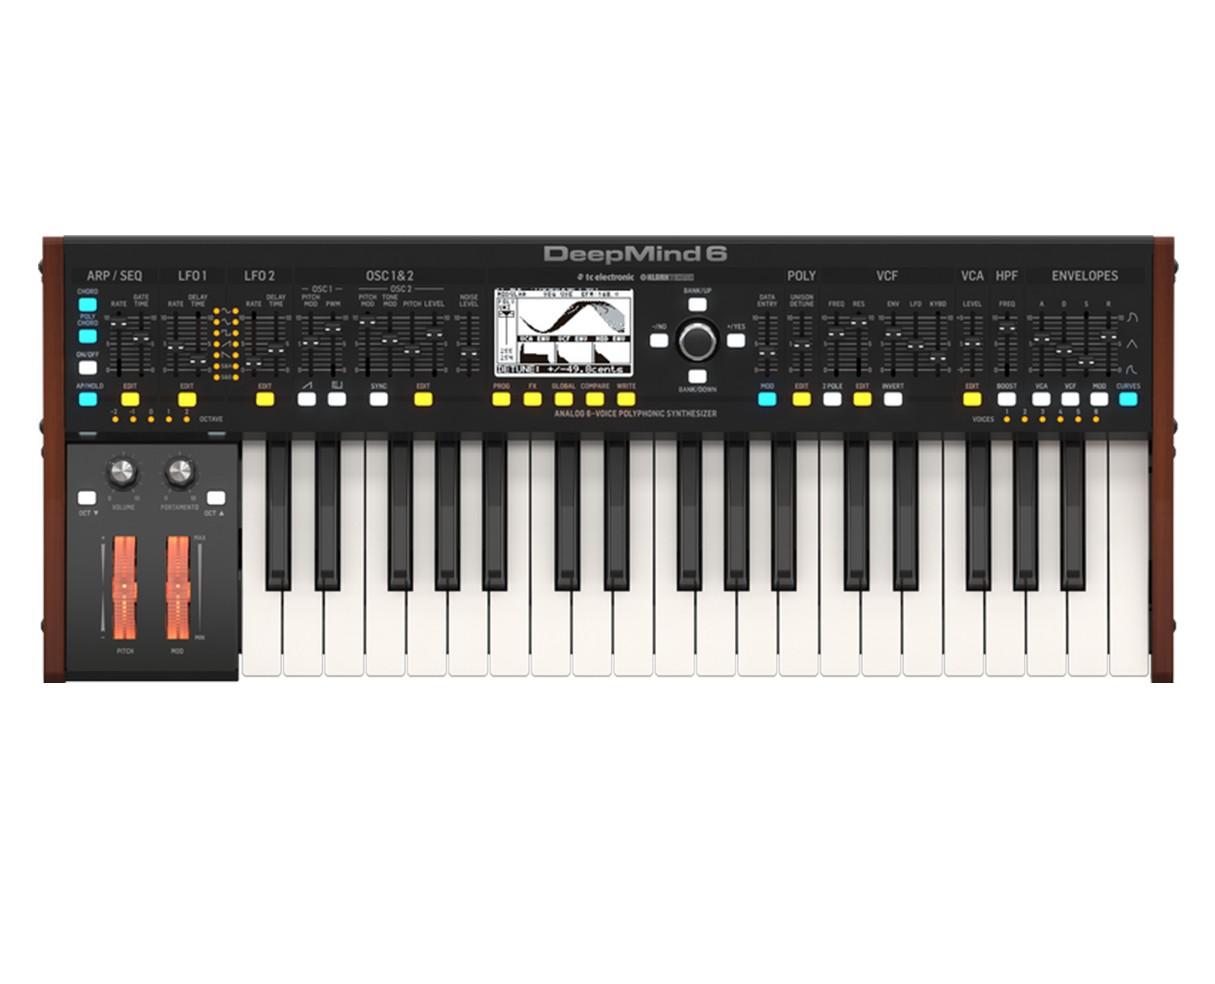 Behringer Deepmind 6 Synthesizer